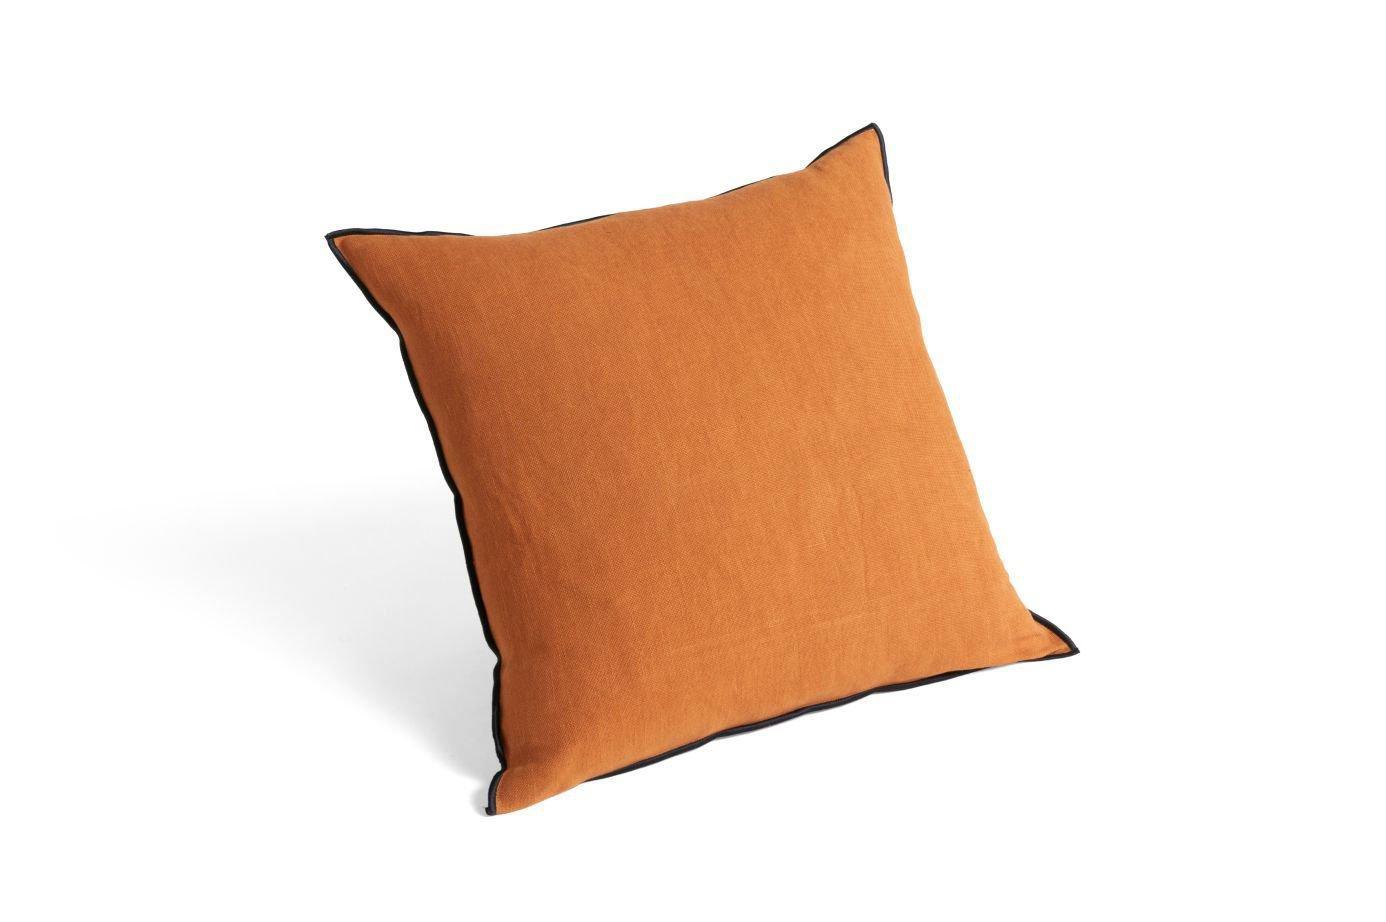 HAY - Outline Cushion, 50 x 50 cm, Sienna